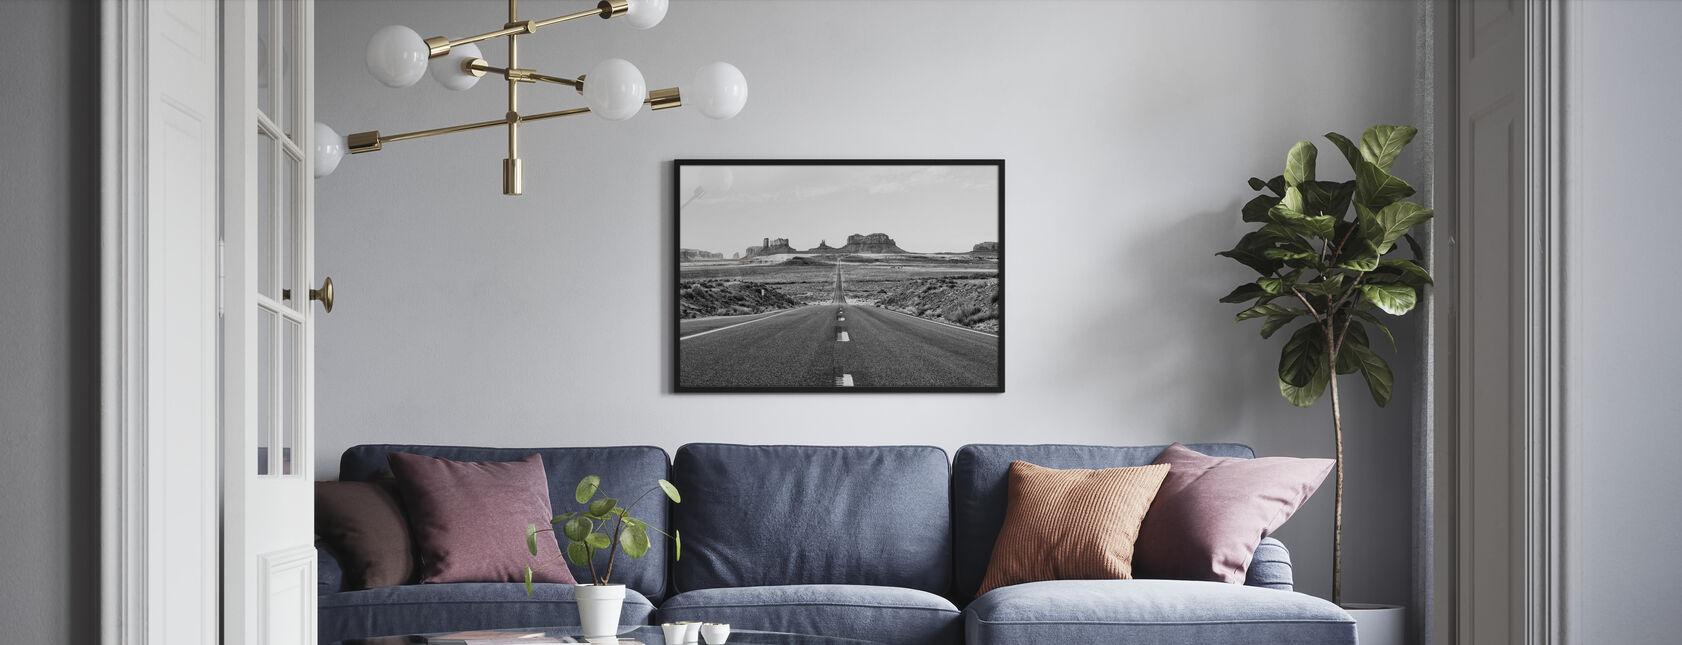 Black Arizona - Monument Valley Road - Poster - Living Room